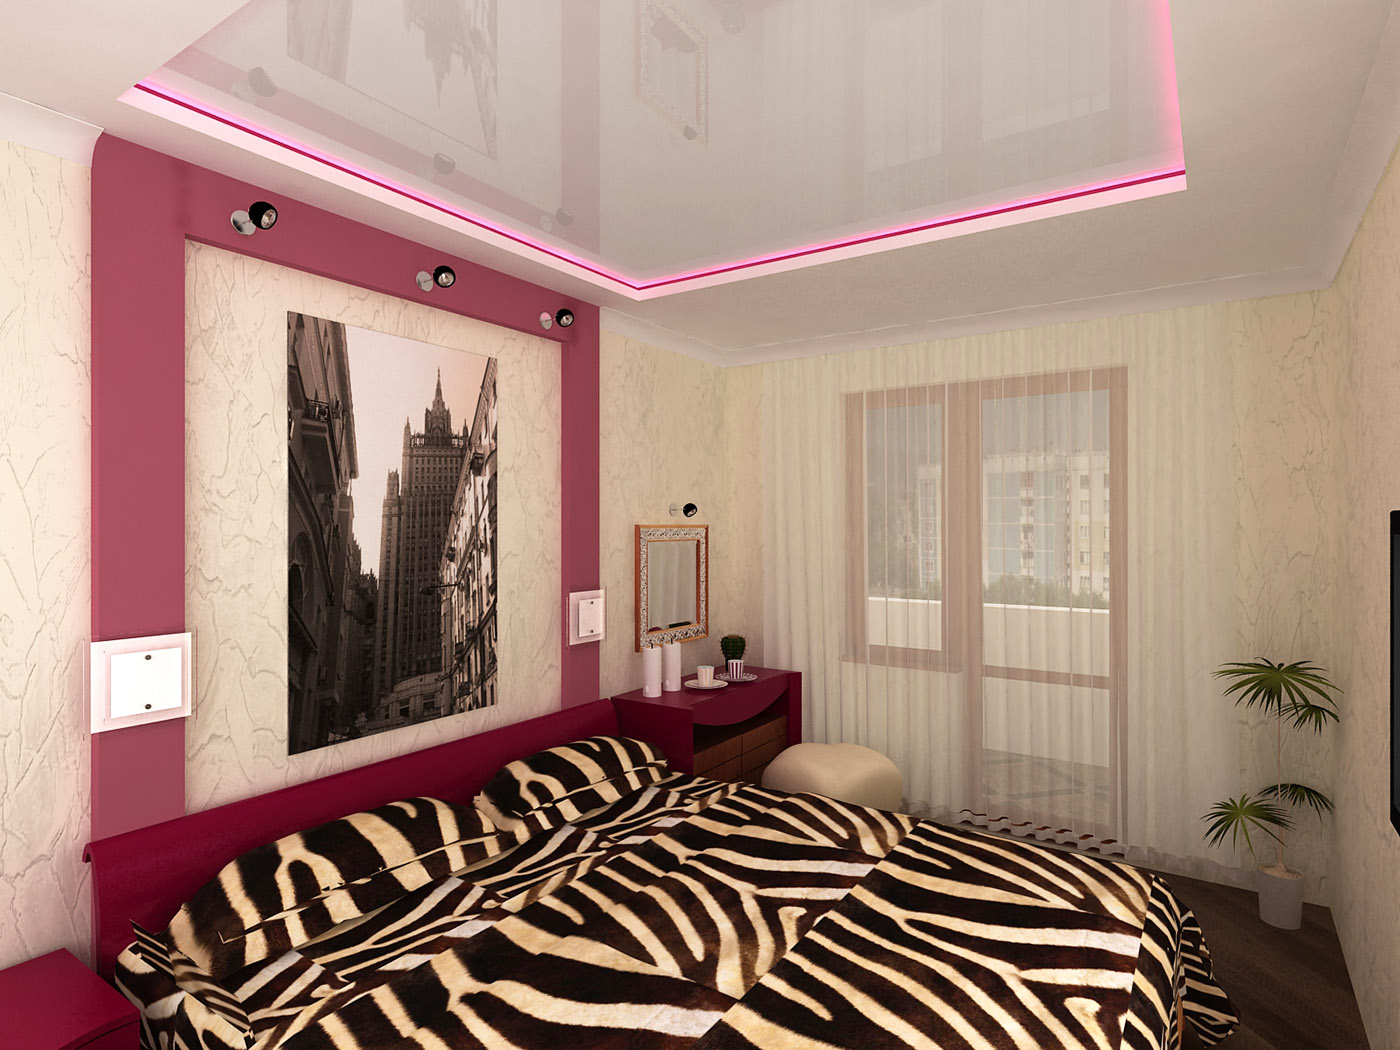 Ремонт комнаты дизайн реальные